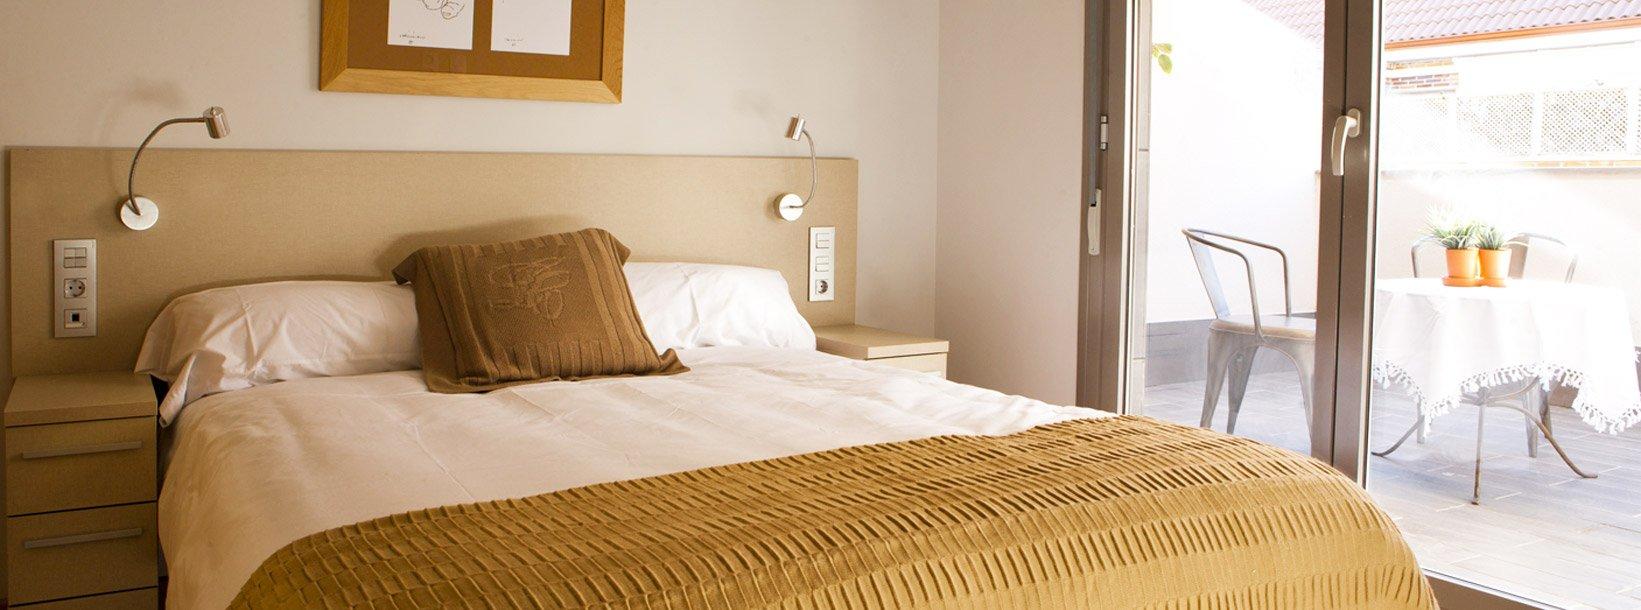 Alquiler de pisos en madrid meses semanas larga estancia for Alquiler apartamentos sevilla espana